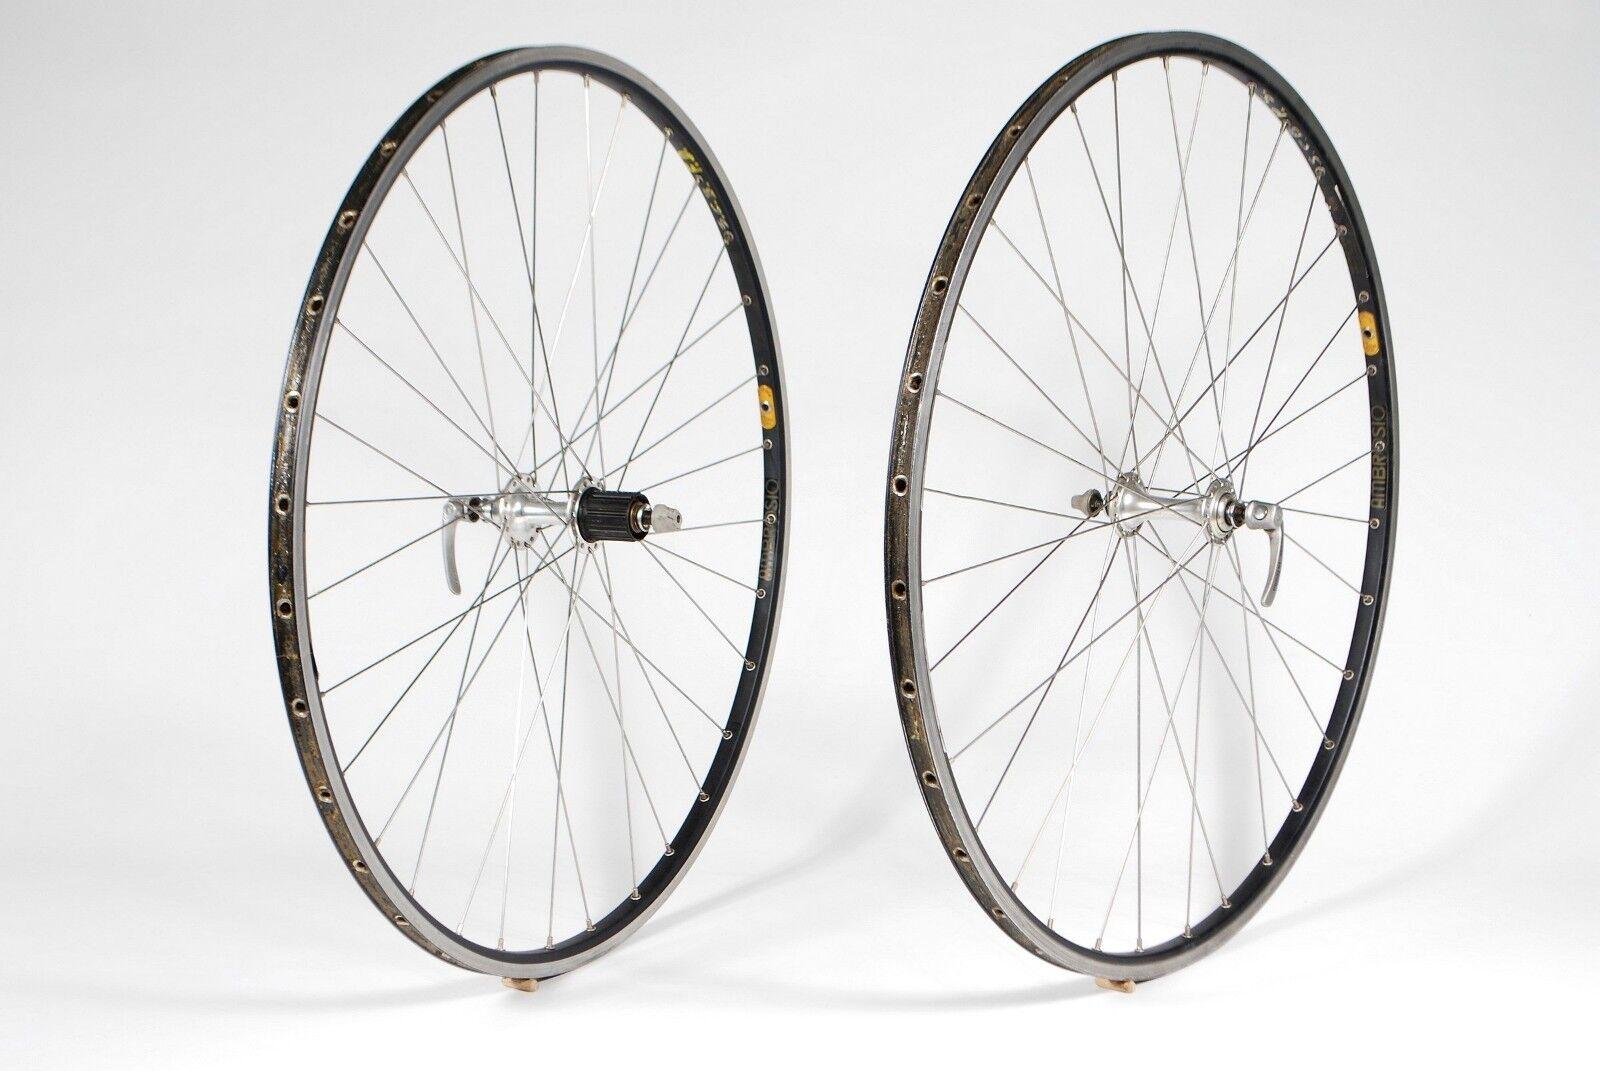 Ambrosio Excellence Bicycle Tubular Wheelset Shimano Ultegra 6500 Hubs 8-9 Speed